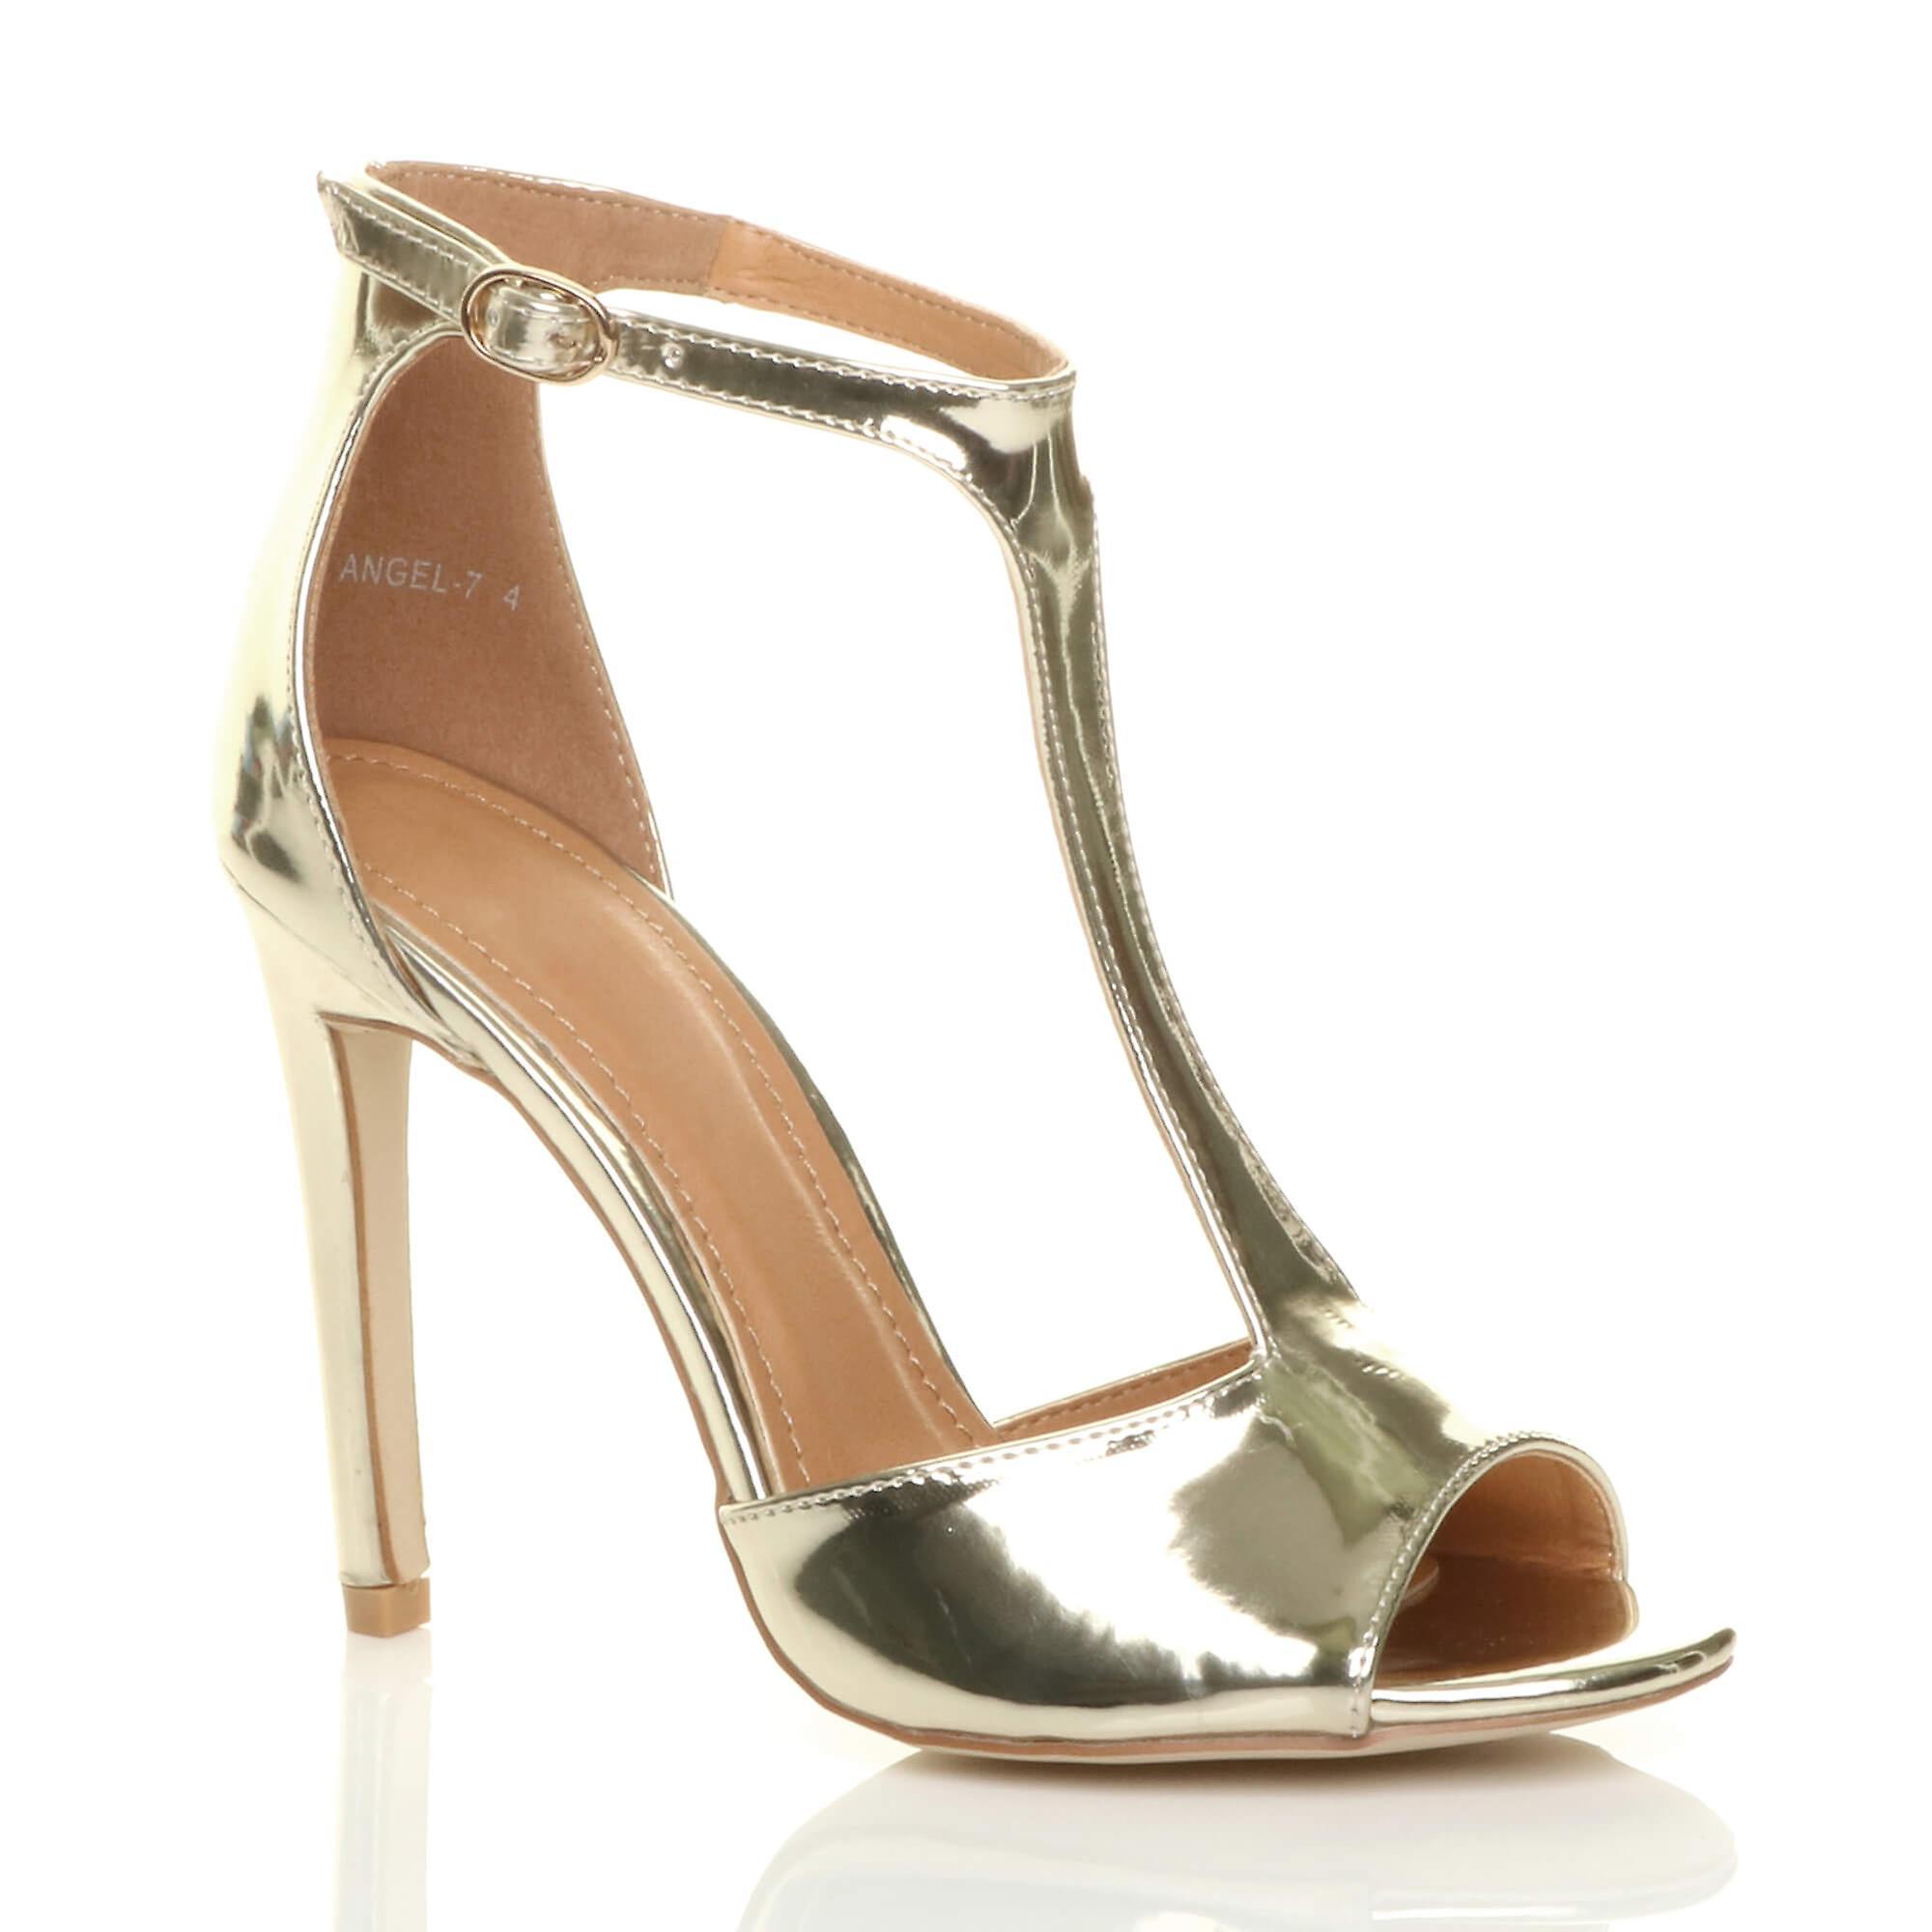 Ajvani damskie szpilki t-bar kostki pasek partii sandały peep toe buty rozmiar 5qsAR